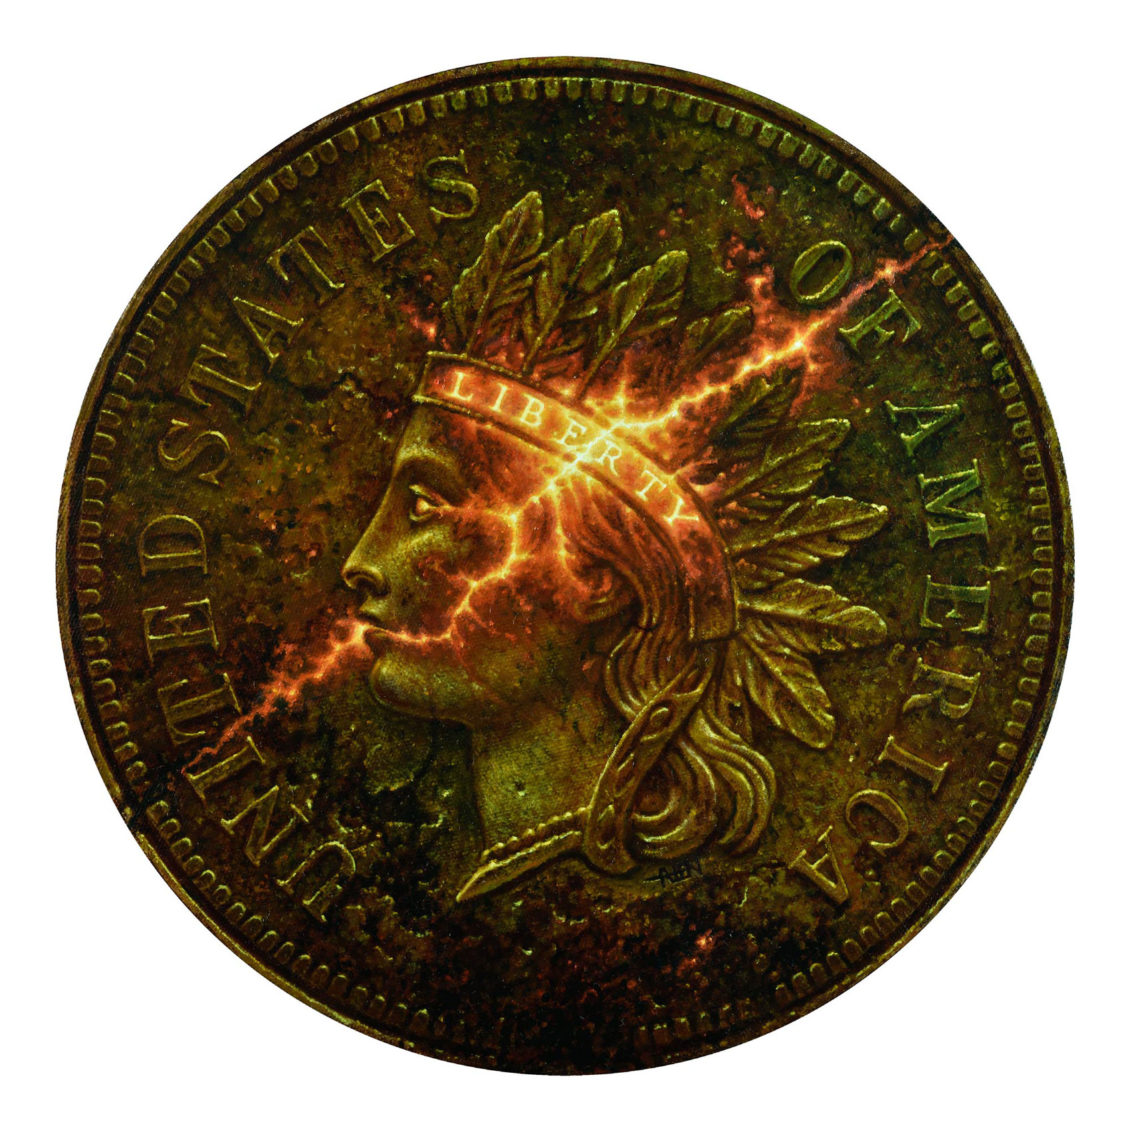 Arteclat - One Cent Tomasz Alen Kopera